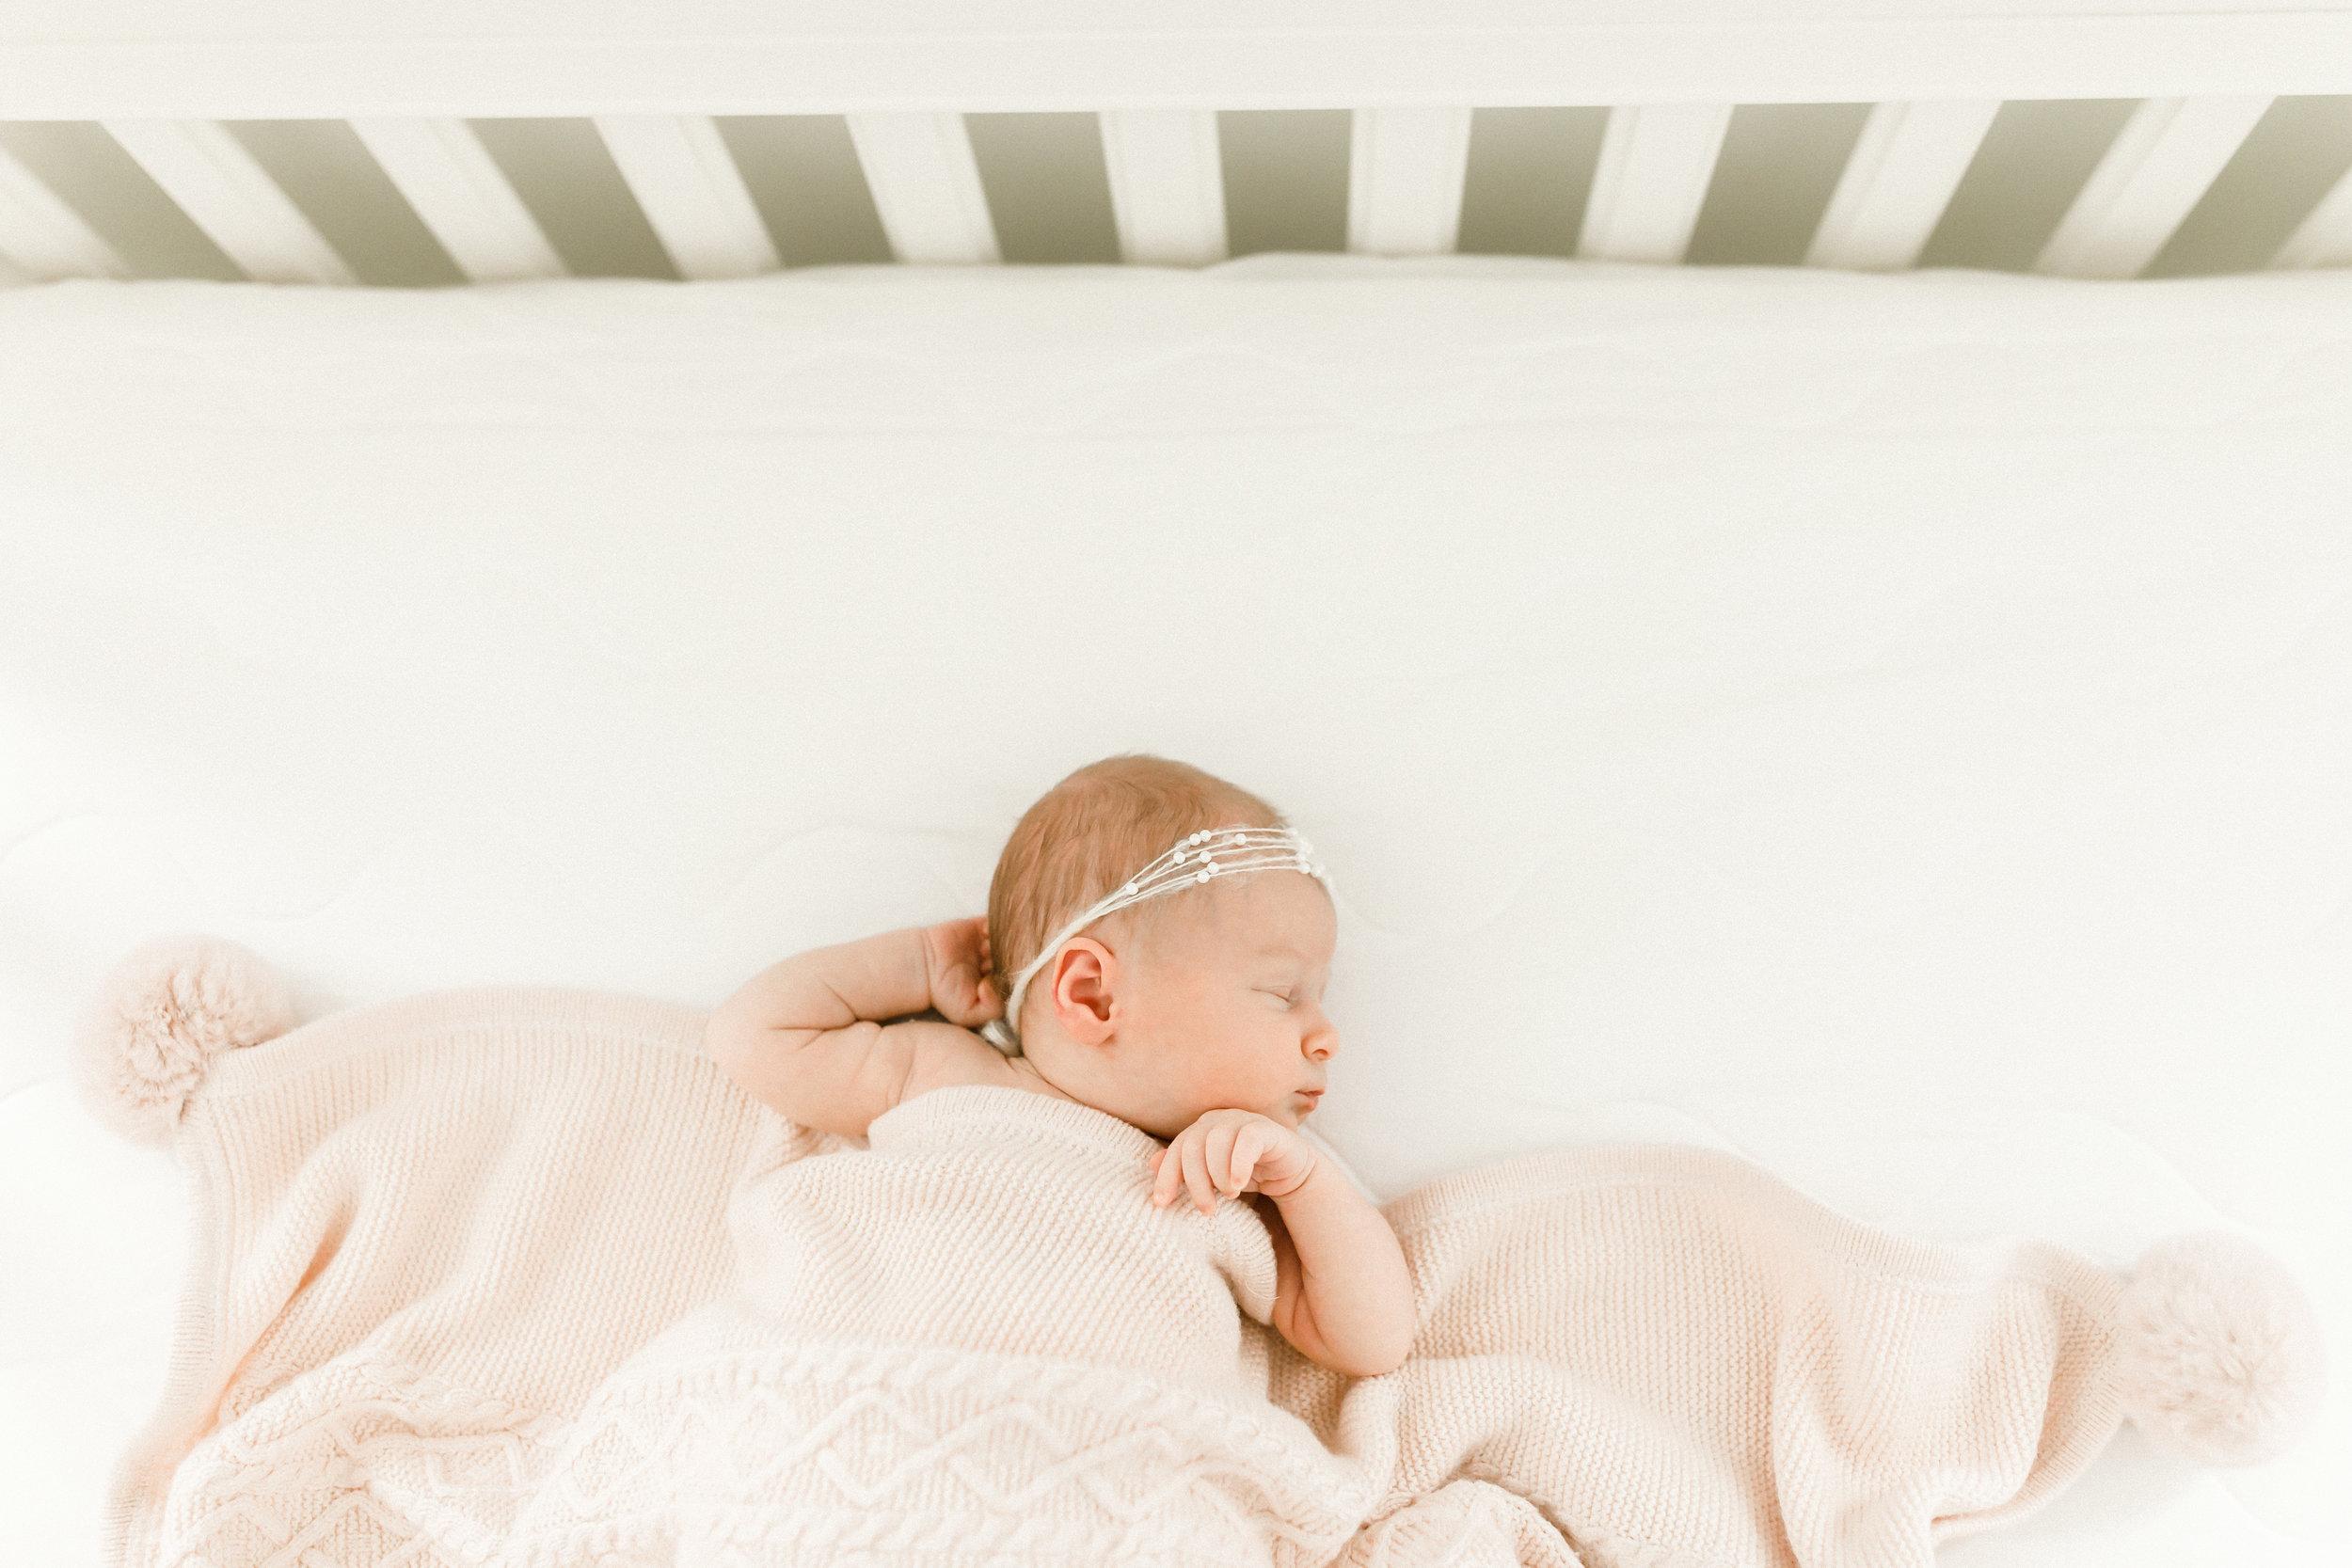 chicago newborn lifestyle photographer jenny grimm photography baby girl white crib